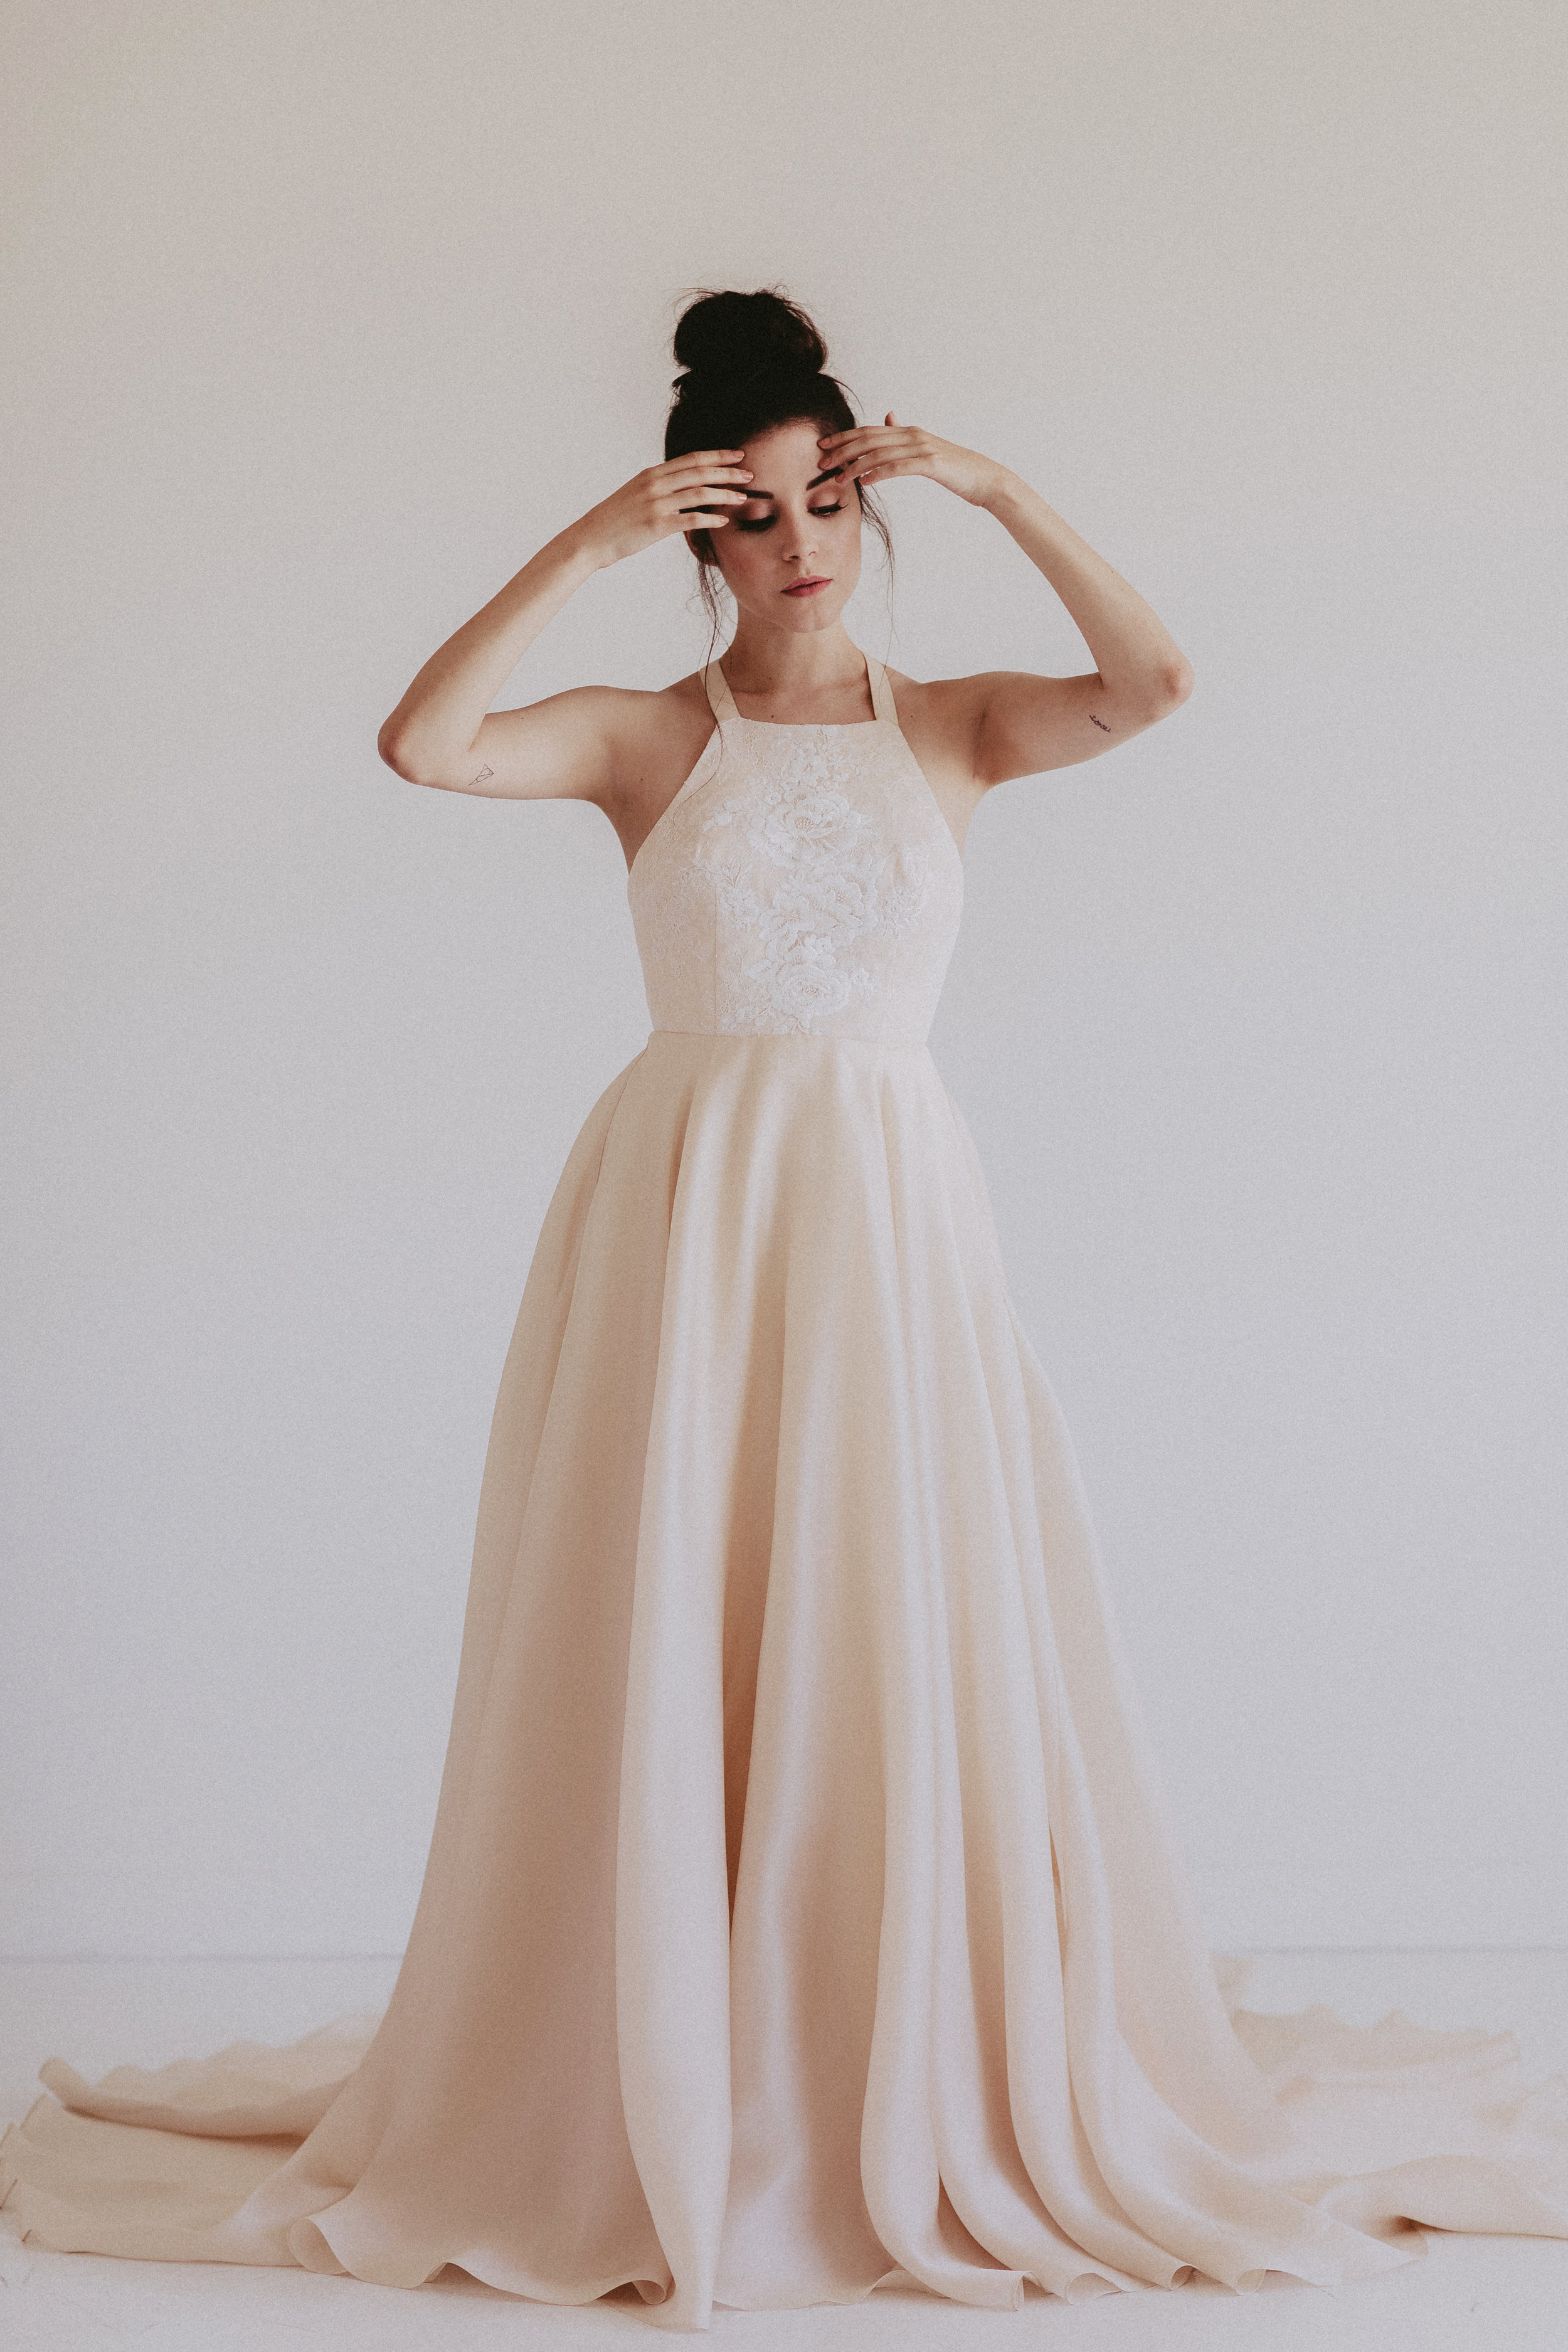 Remington by Chantel lauren hand painted blush wedding gown